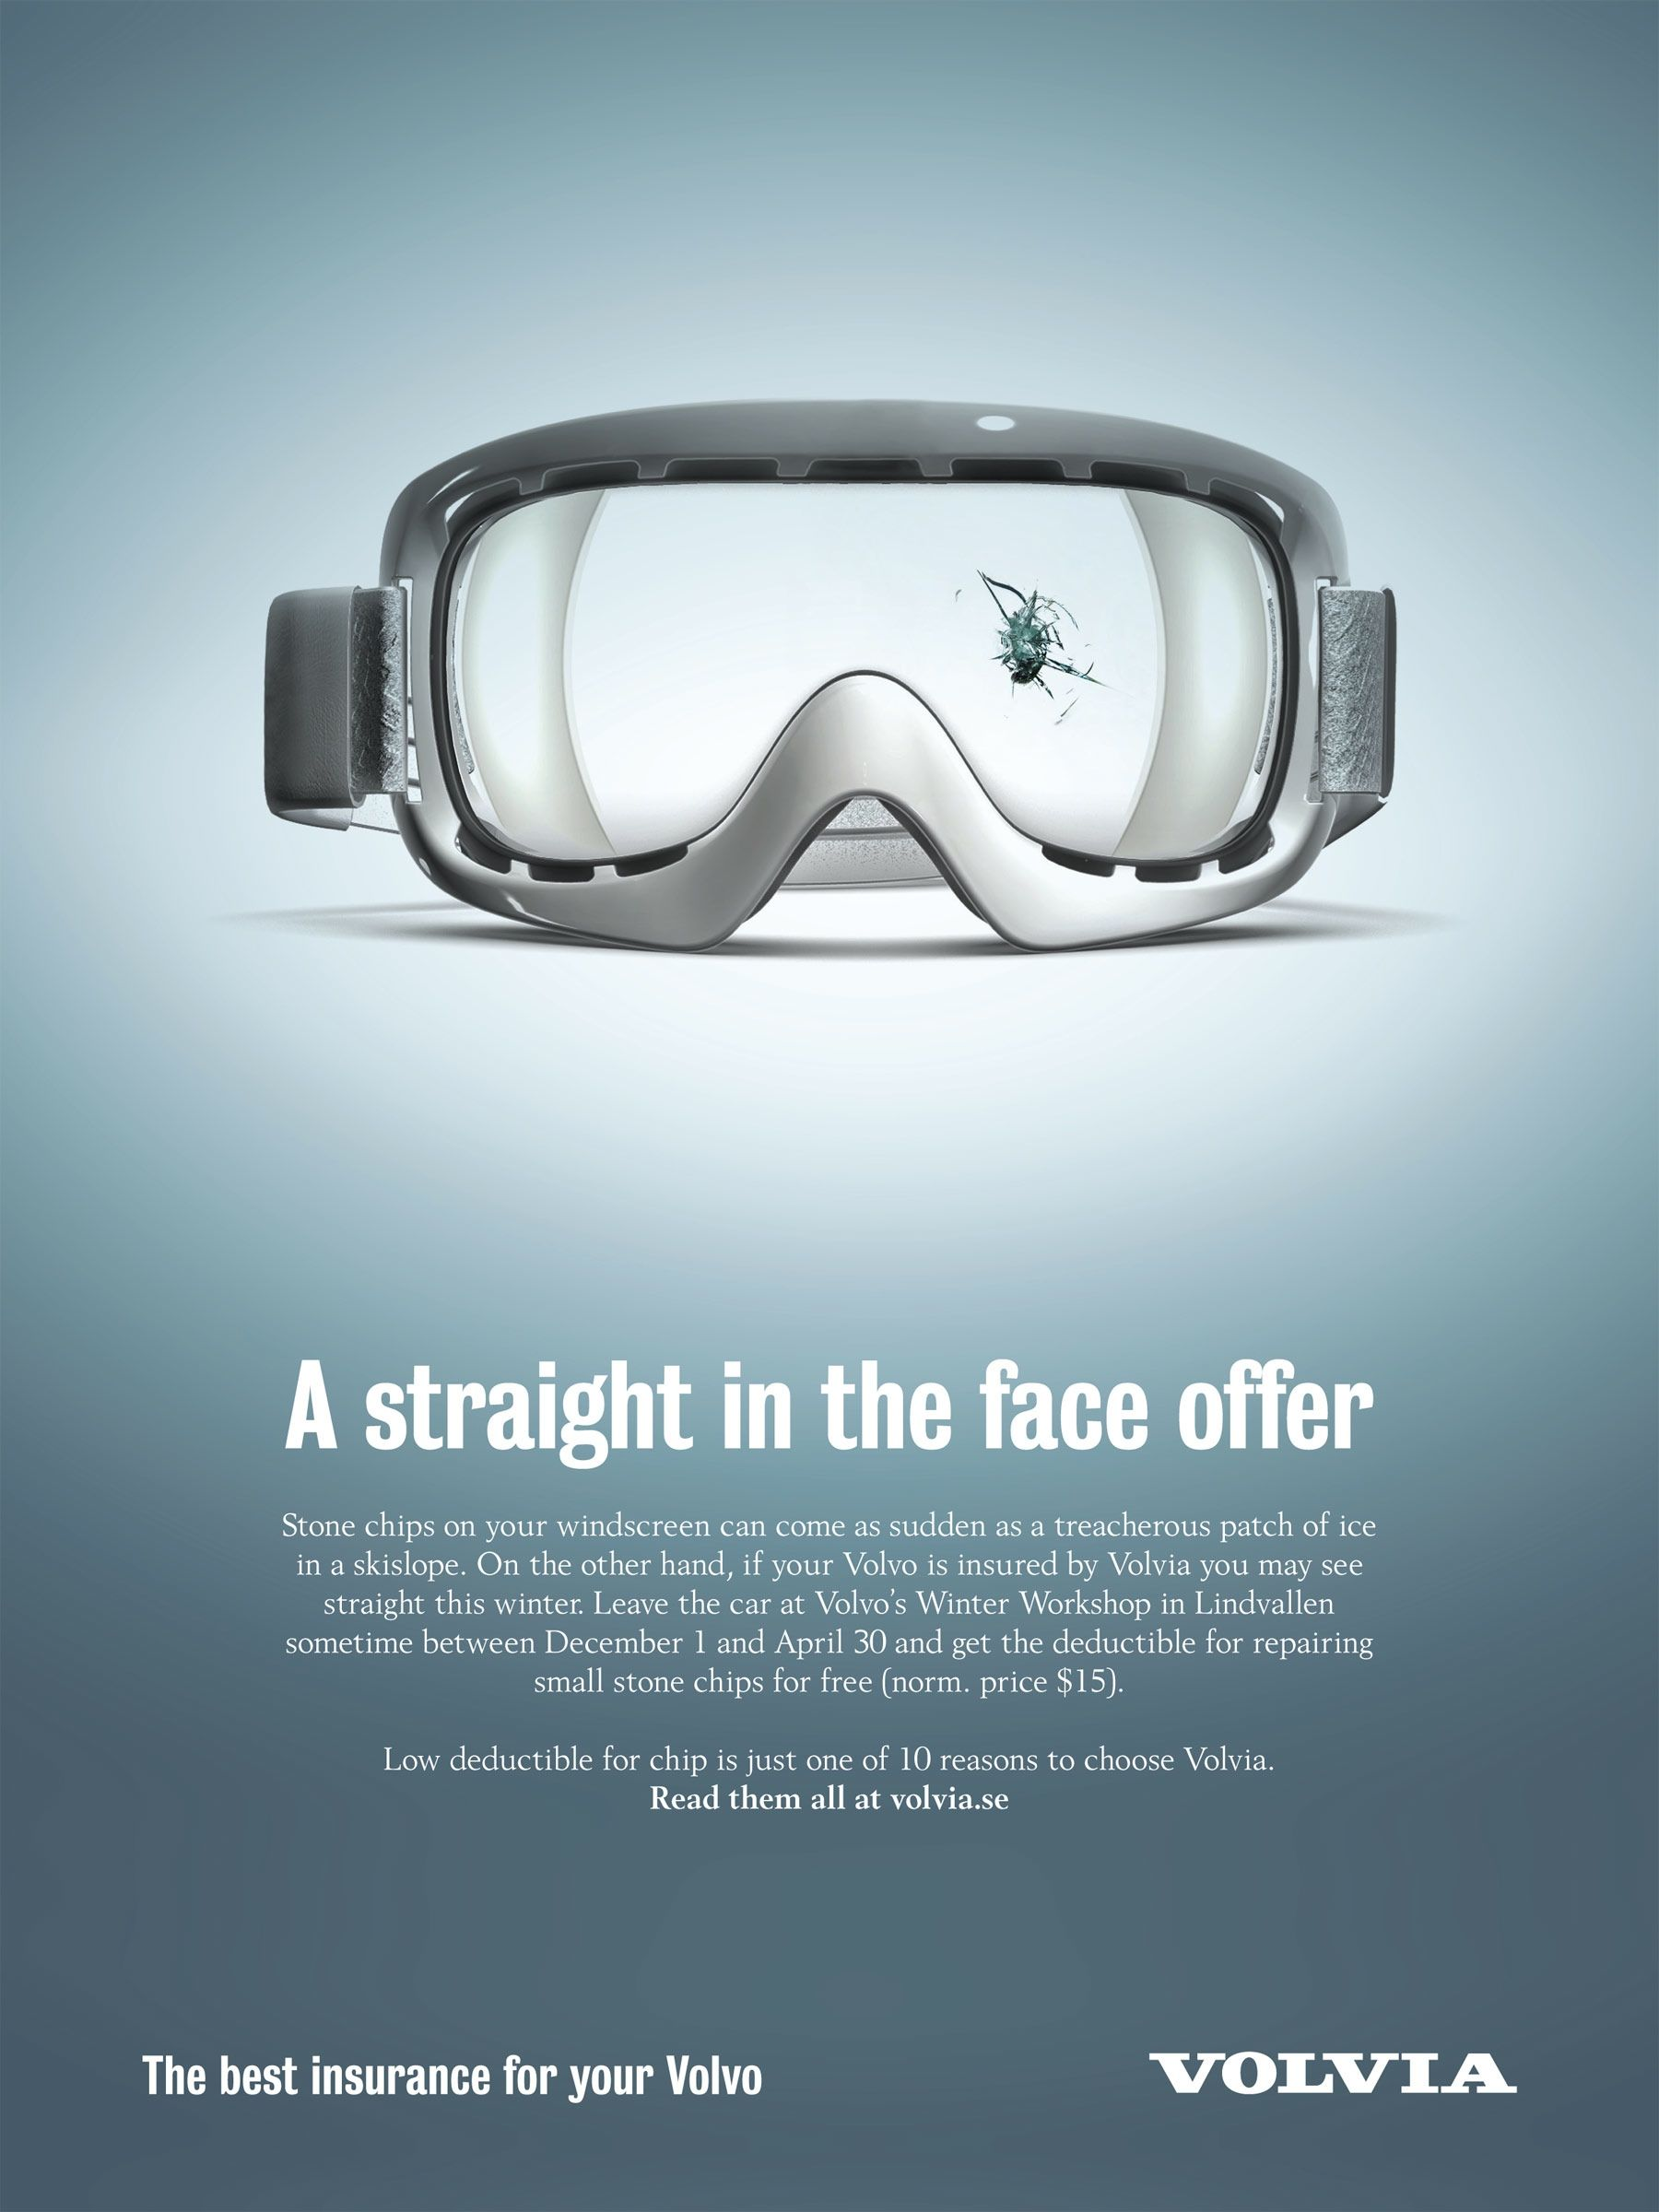 Volvia Car Insurance Goggles Print Advertising Ads Creative Advertising